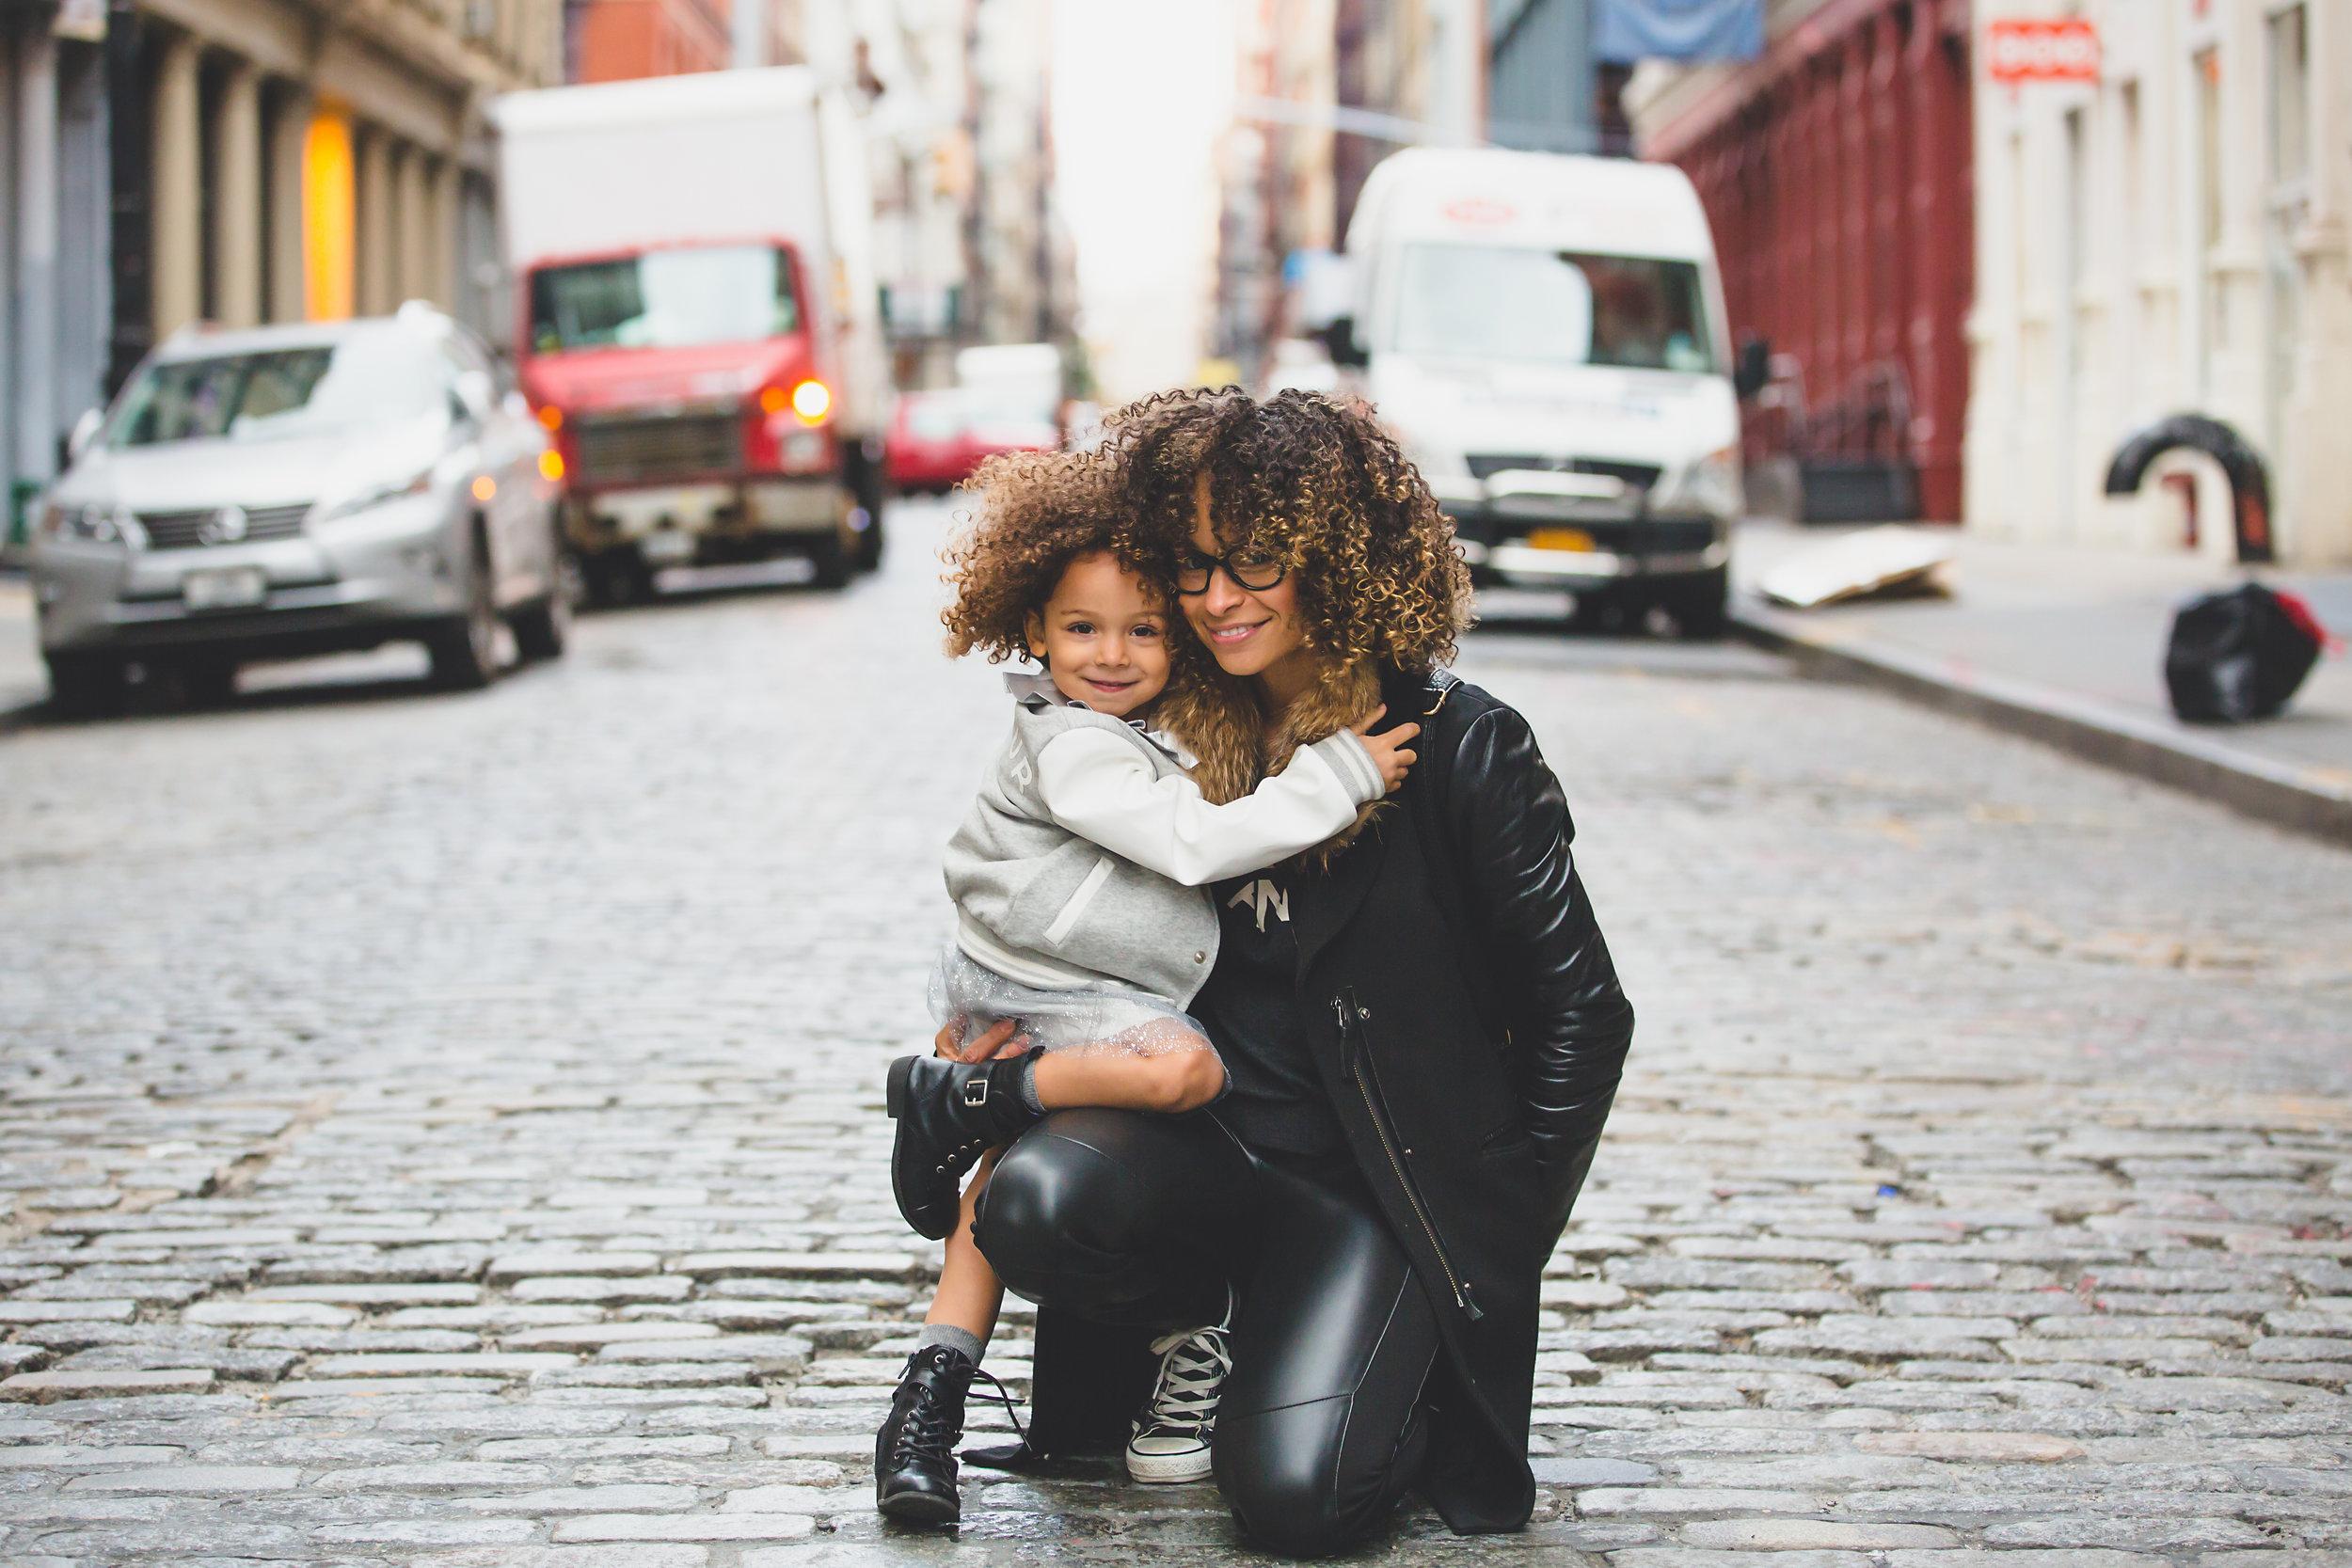 raising-ugly-daughters-part-2-redefine-enough_orig.png